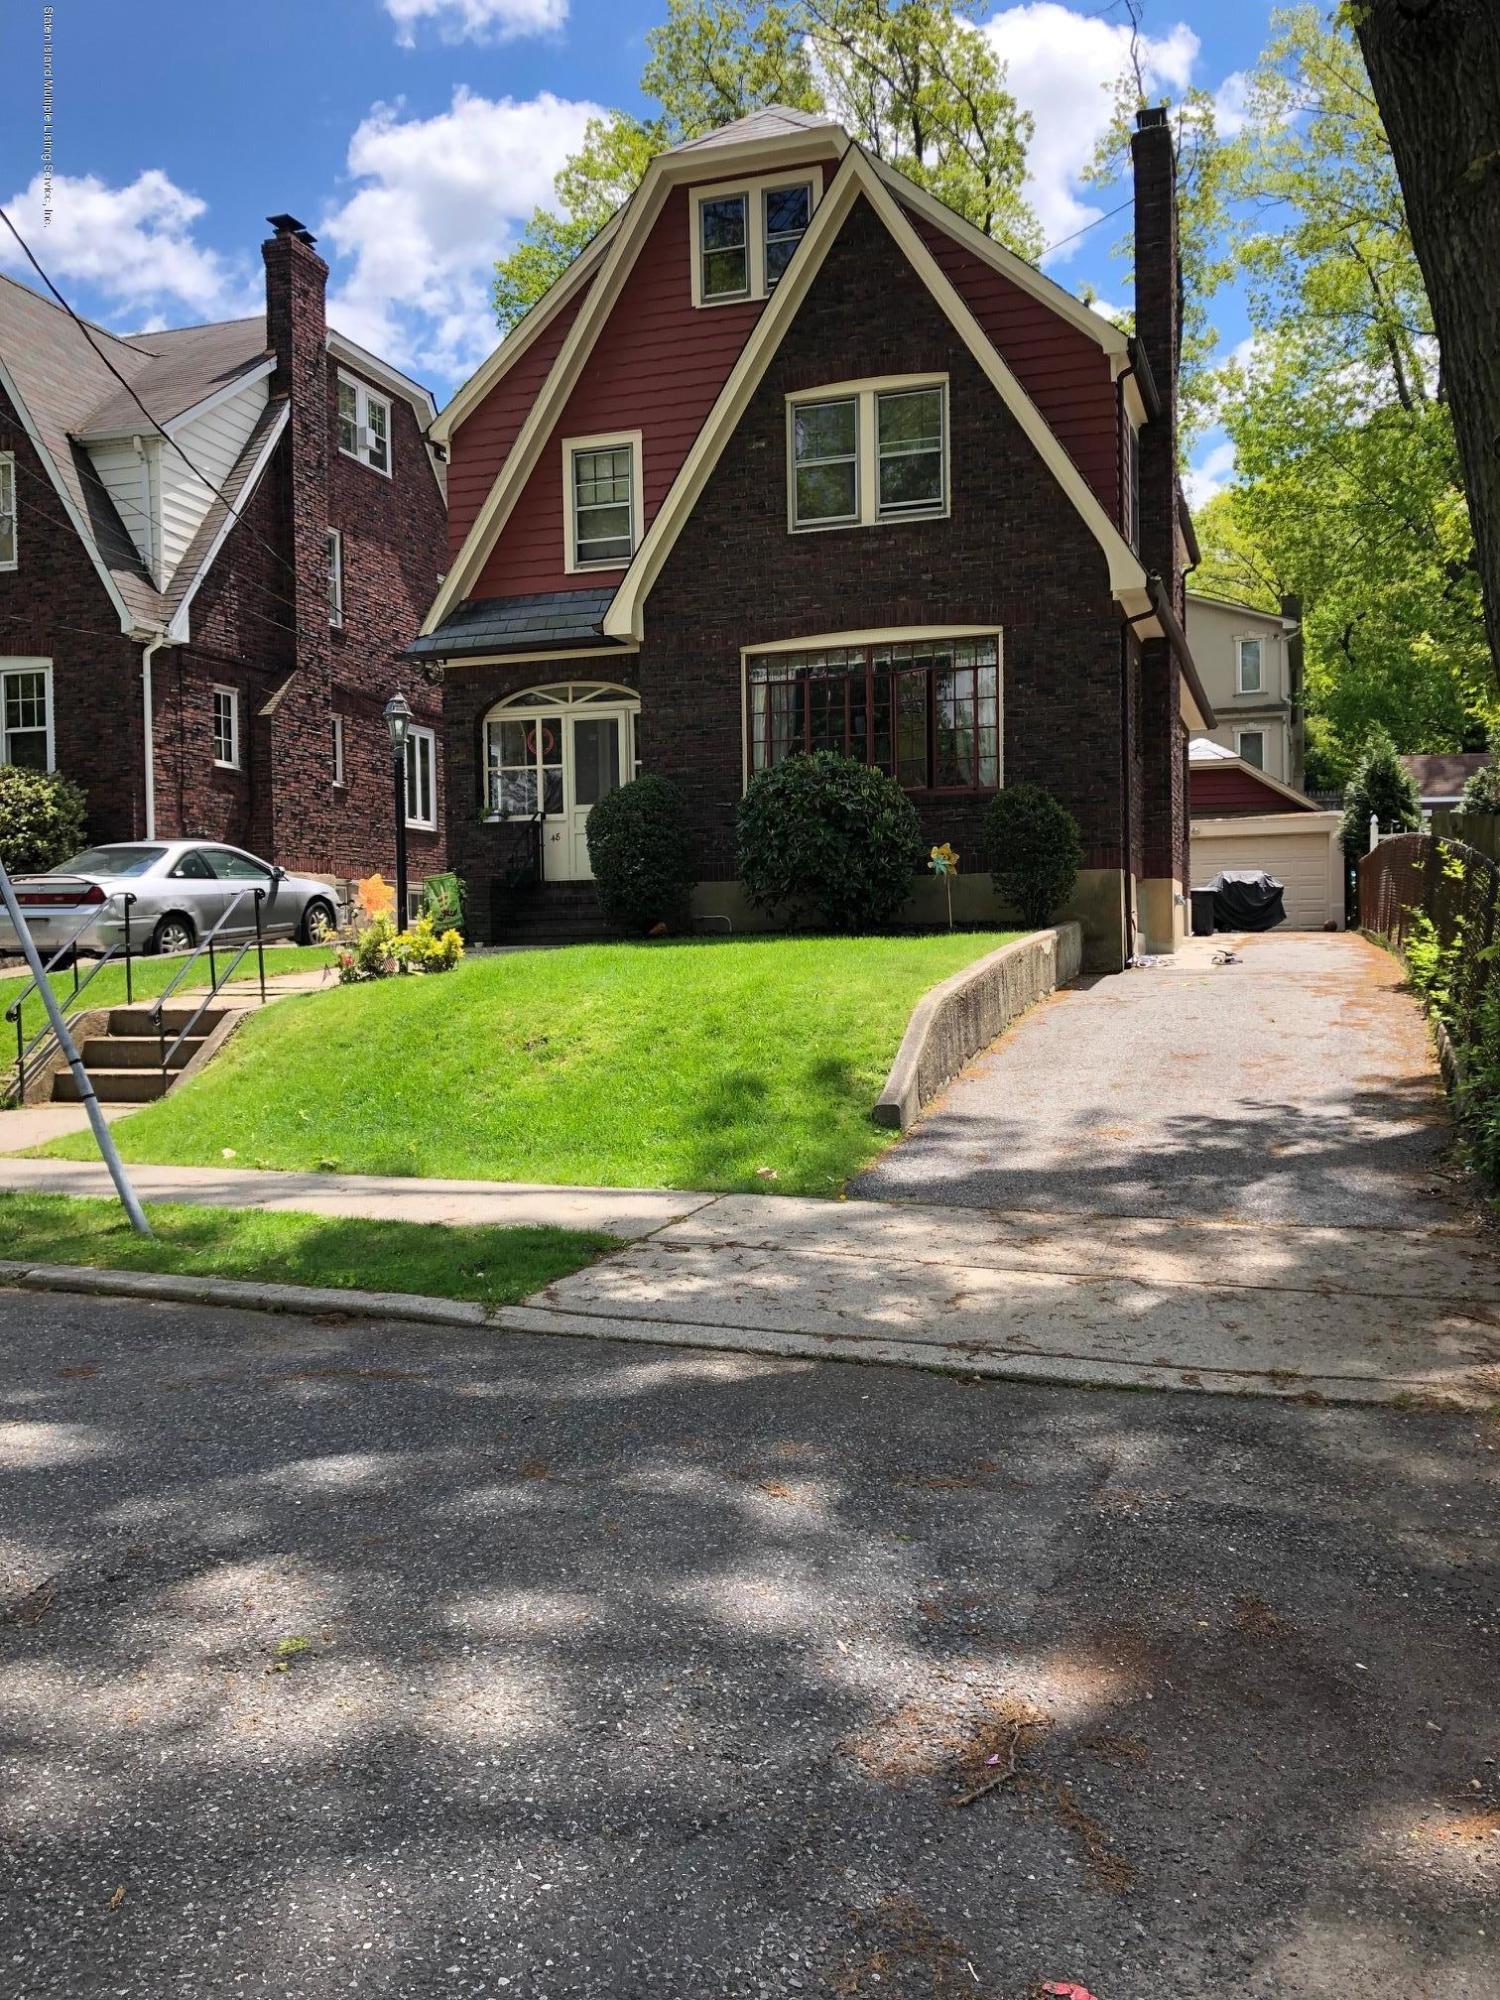 Single Family - Detached 48 Park Court  Staten Island, NY 10301, MLS-1129200-3